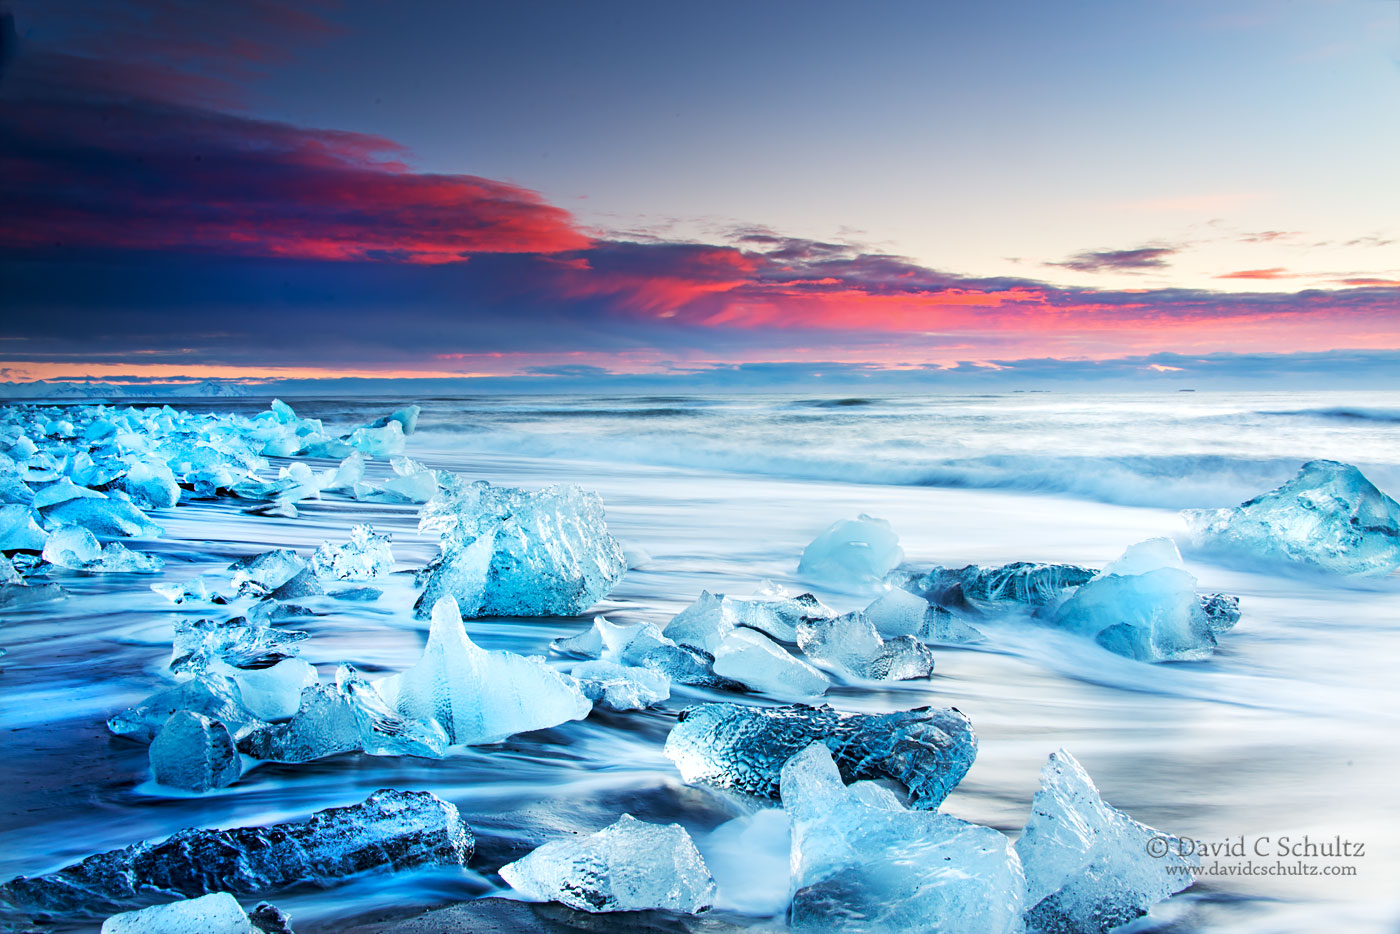 Jokulsarlon Glacier Lagoon, Iceland - Image #211-329